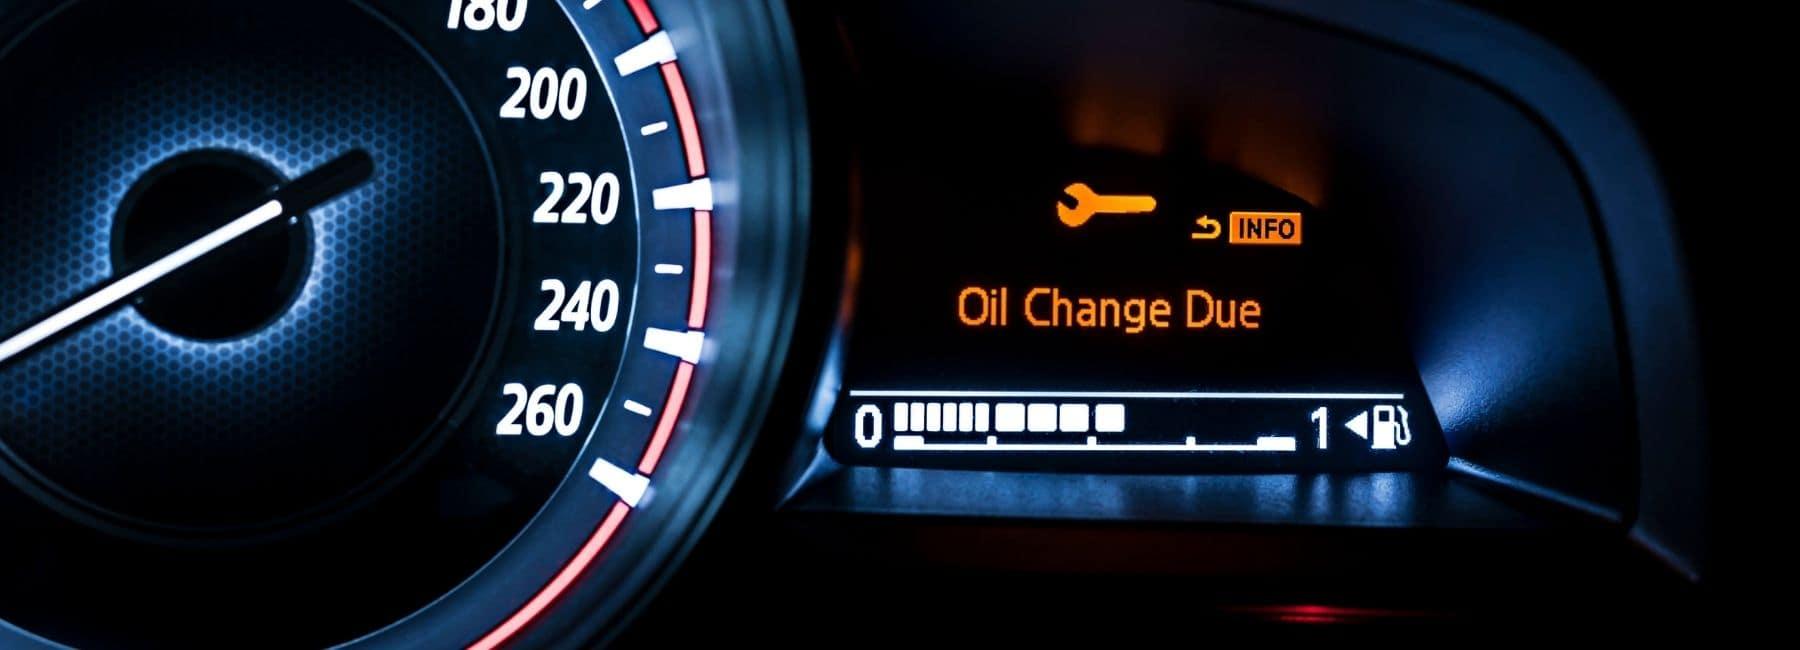 Oil Change Due Light - Auto Repair Ruidoso, NM